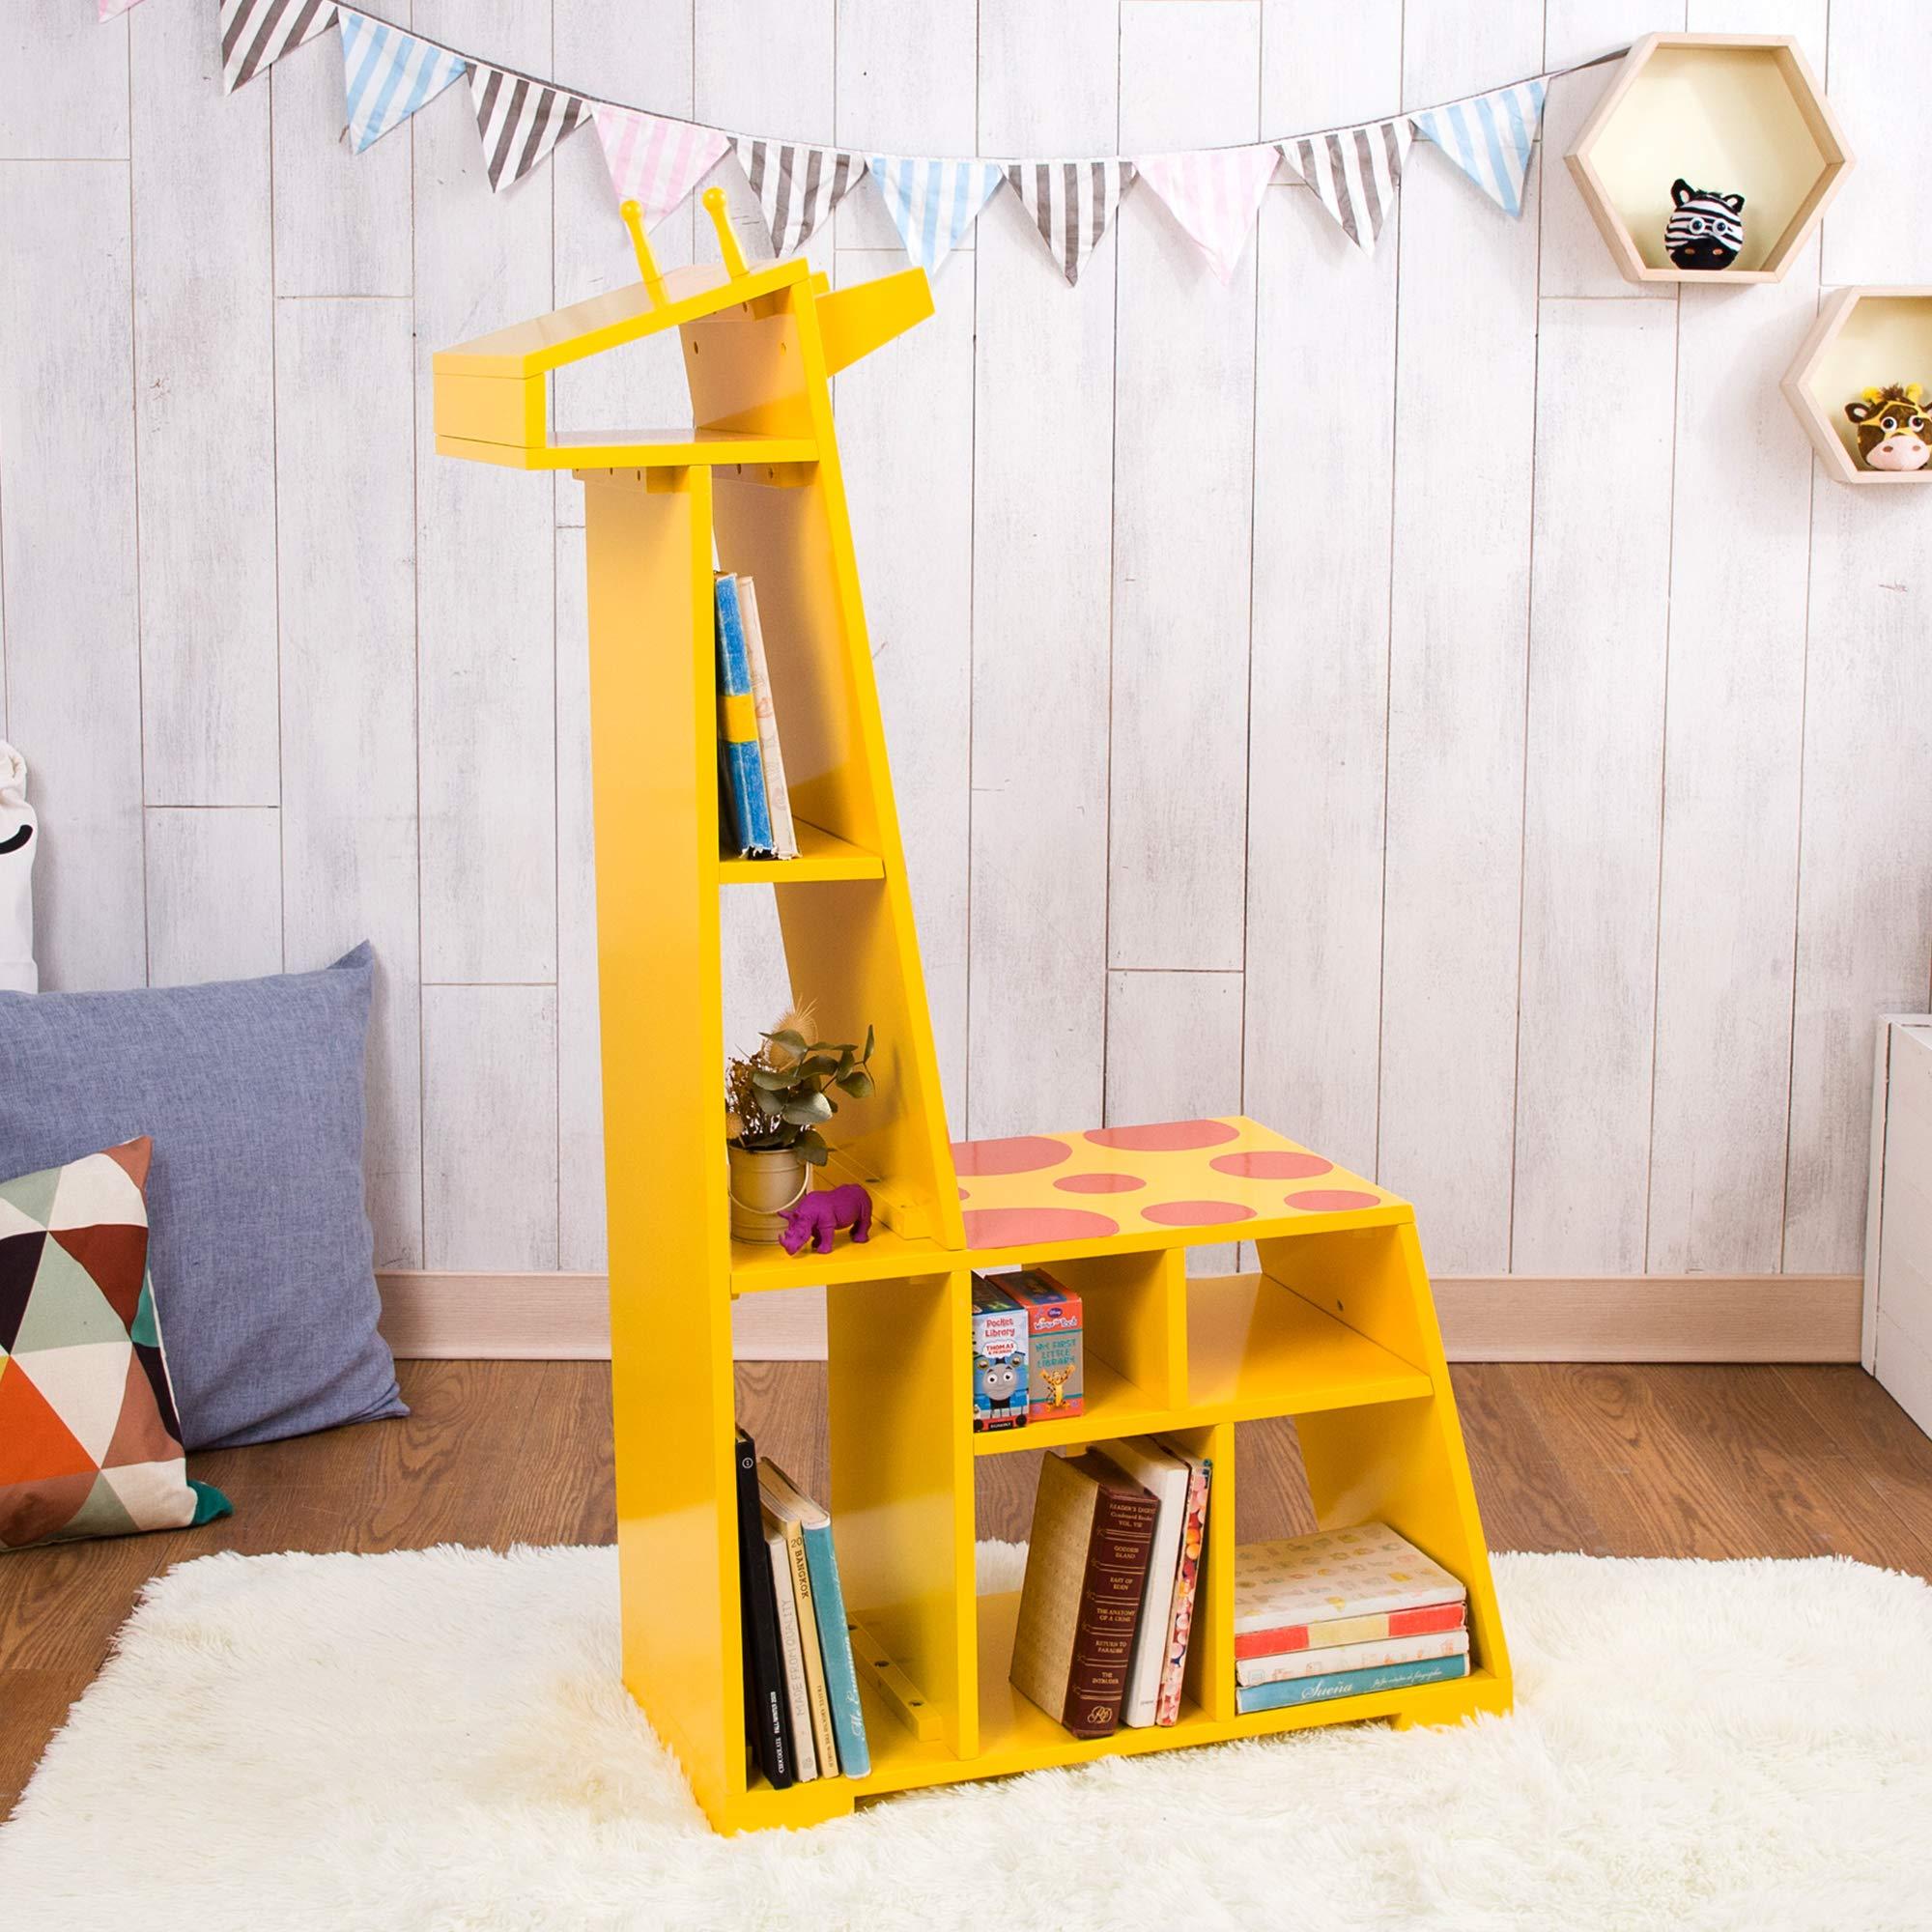 Teamson Kids - Zoo Kingdom Giraffe Bookshelf, Kids Storage - Yellow/Orange